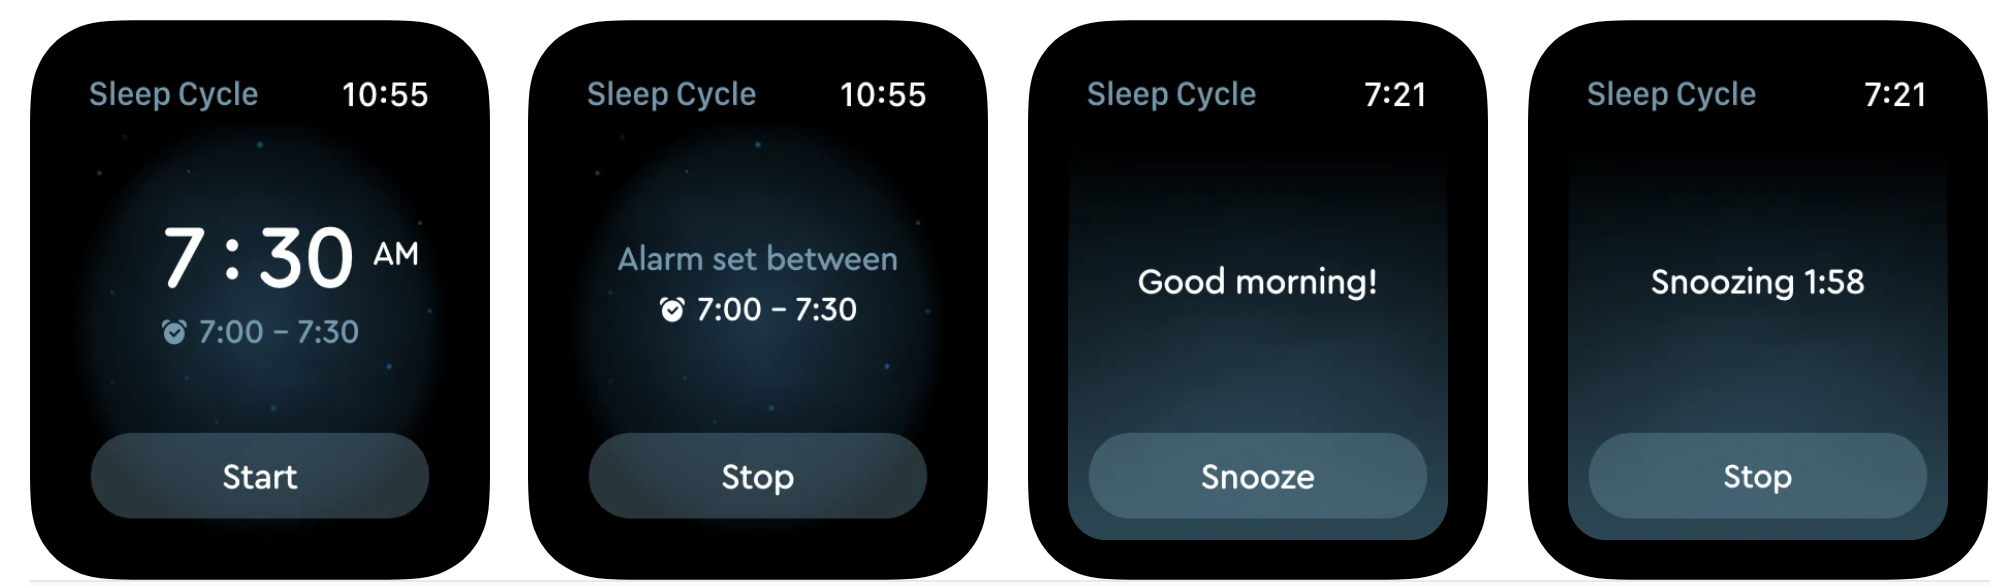 اپلیکیشن کاربردی اپل واچ